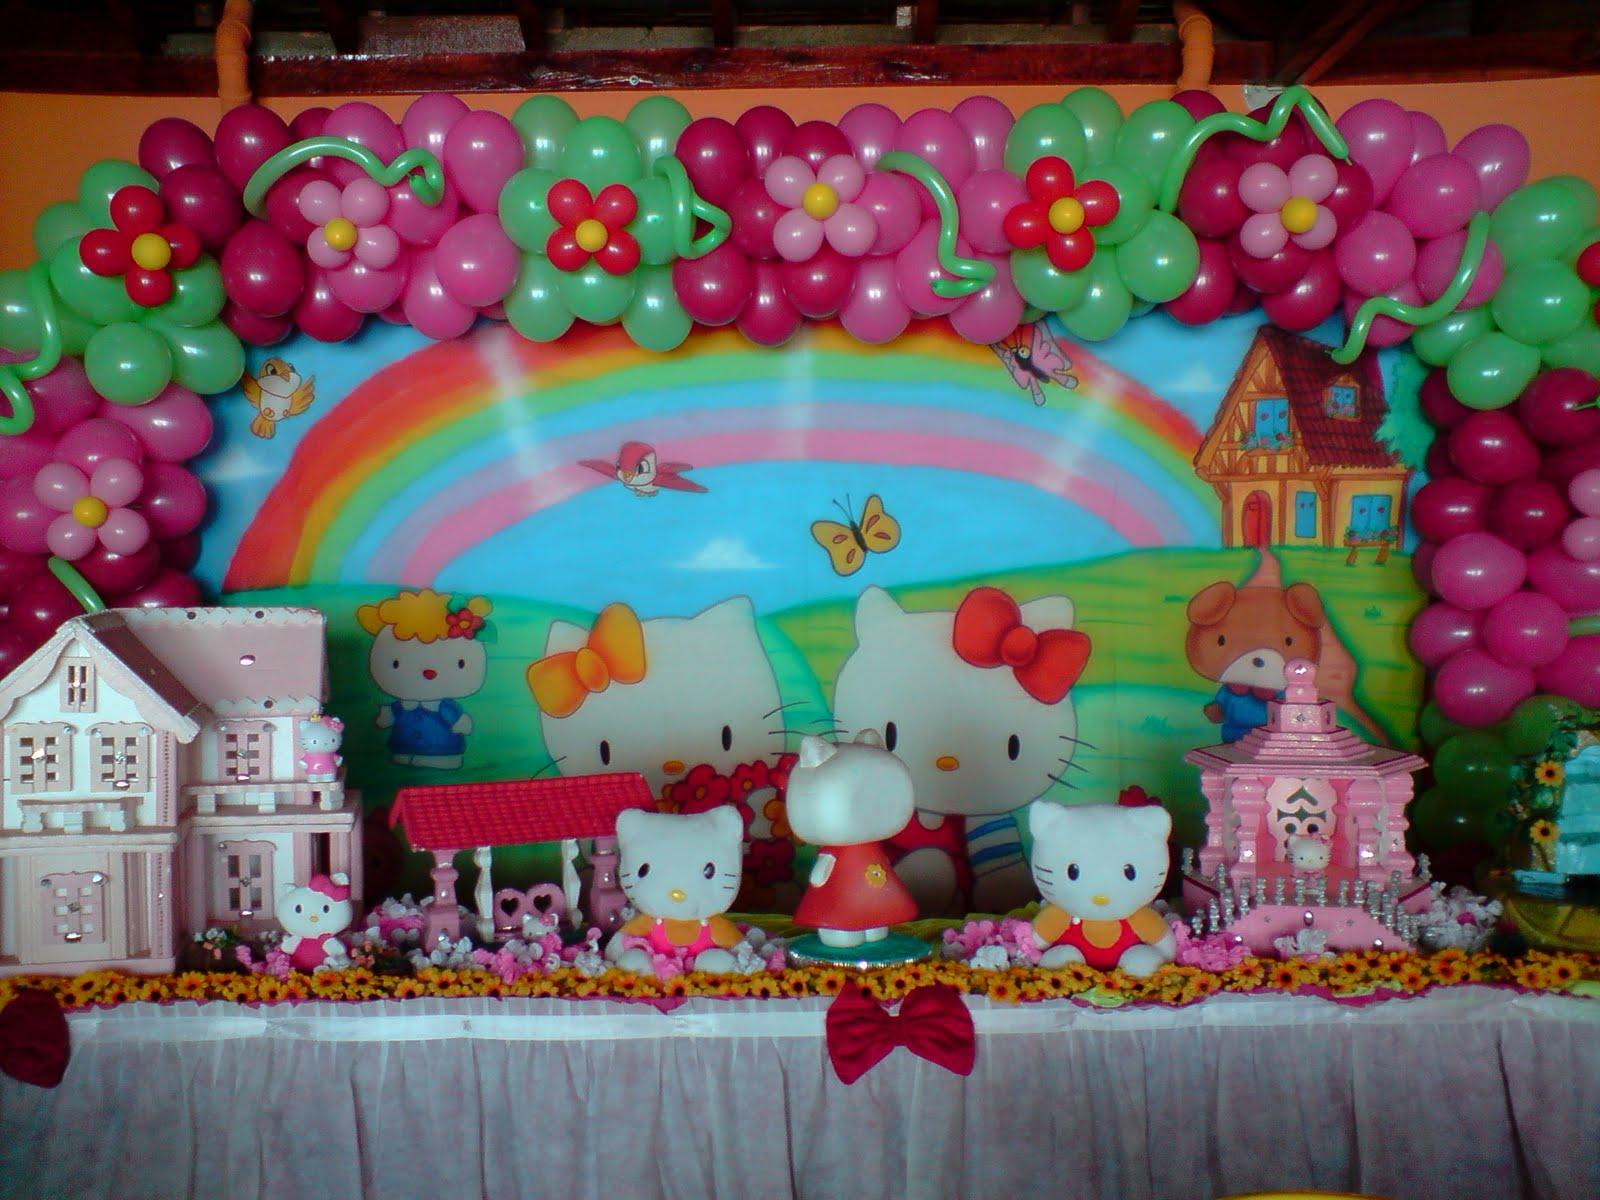 decoracao festa hello kitty : decoracao festa hello kitty ? Doitri.com